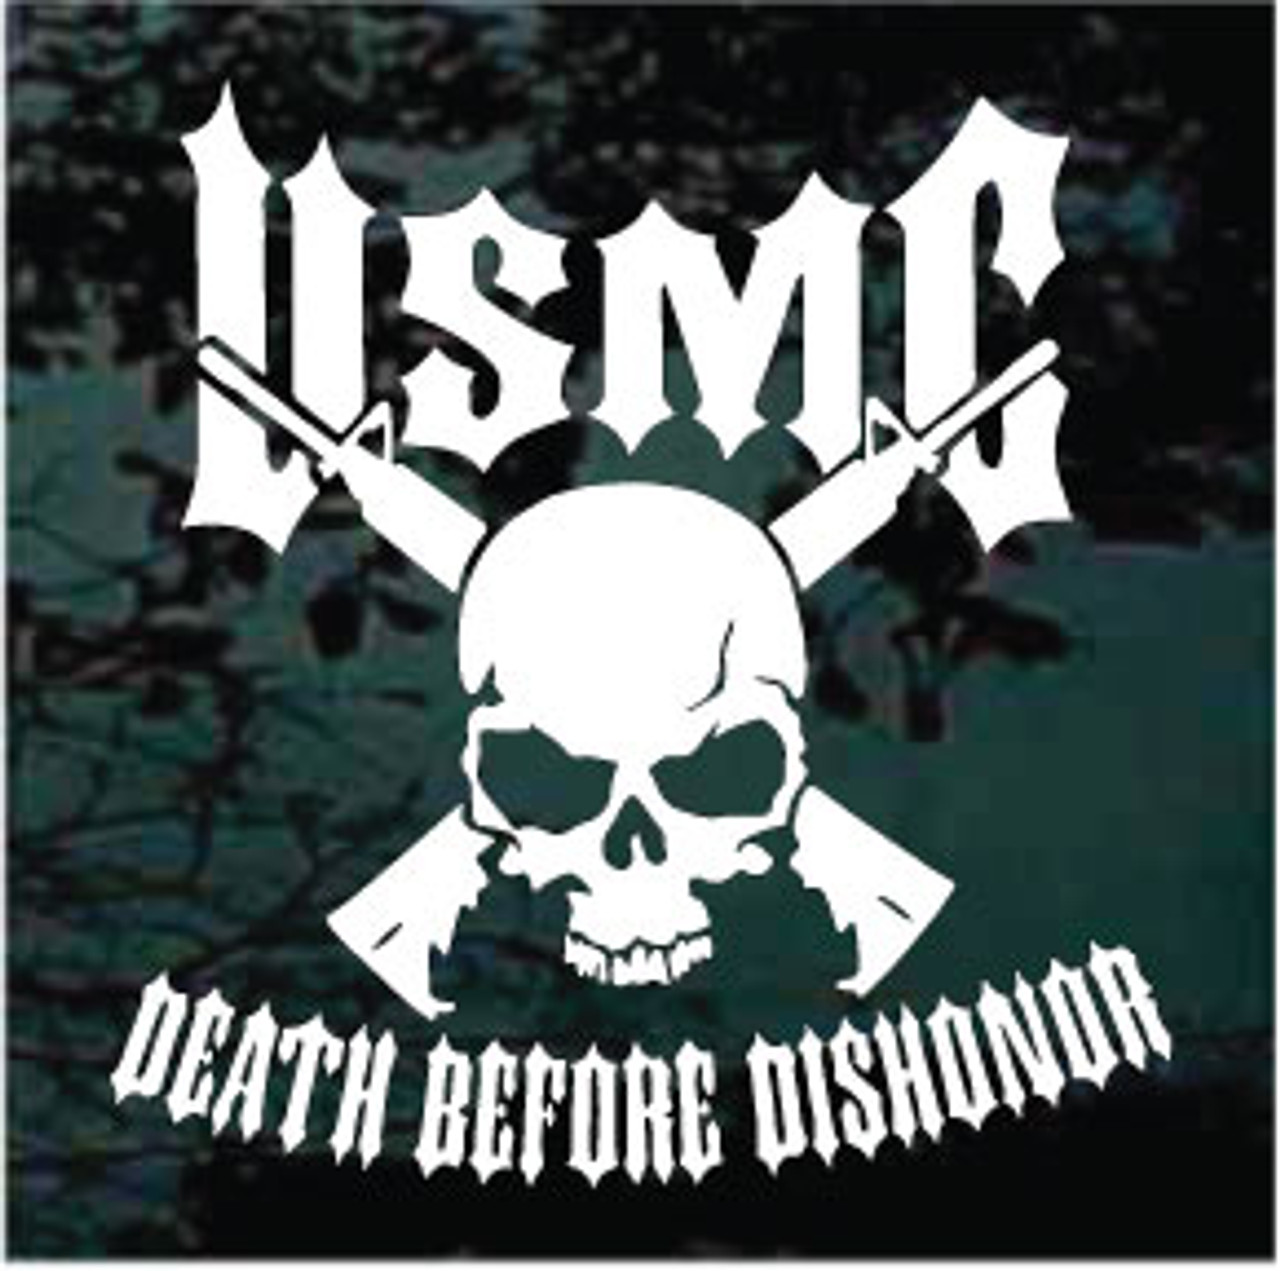 USMC Death Before Dishonor Window Decal